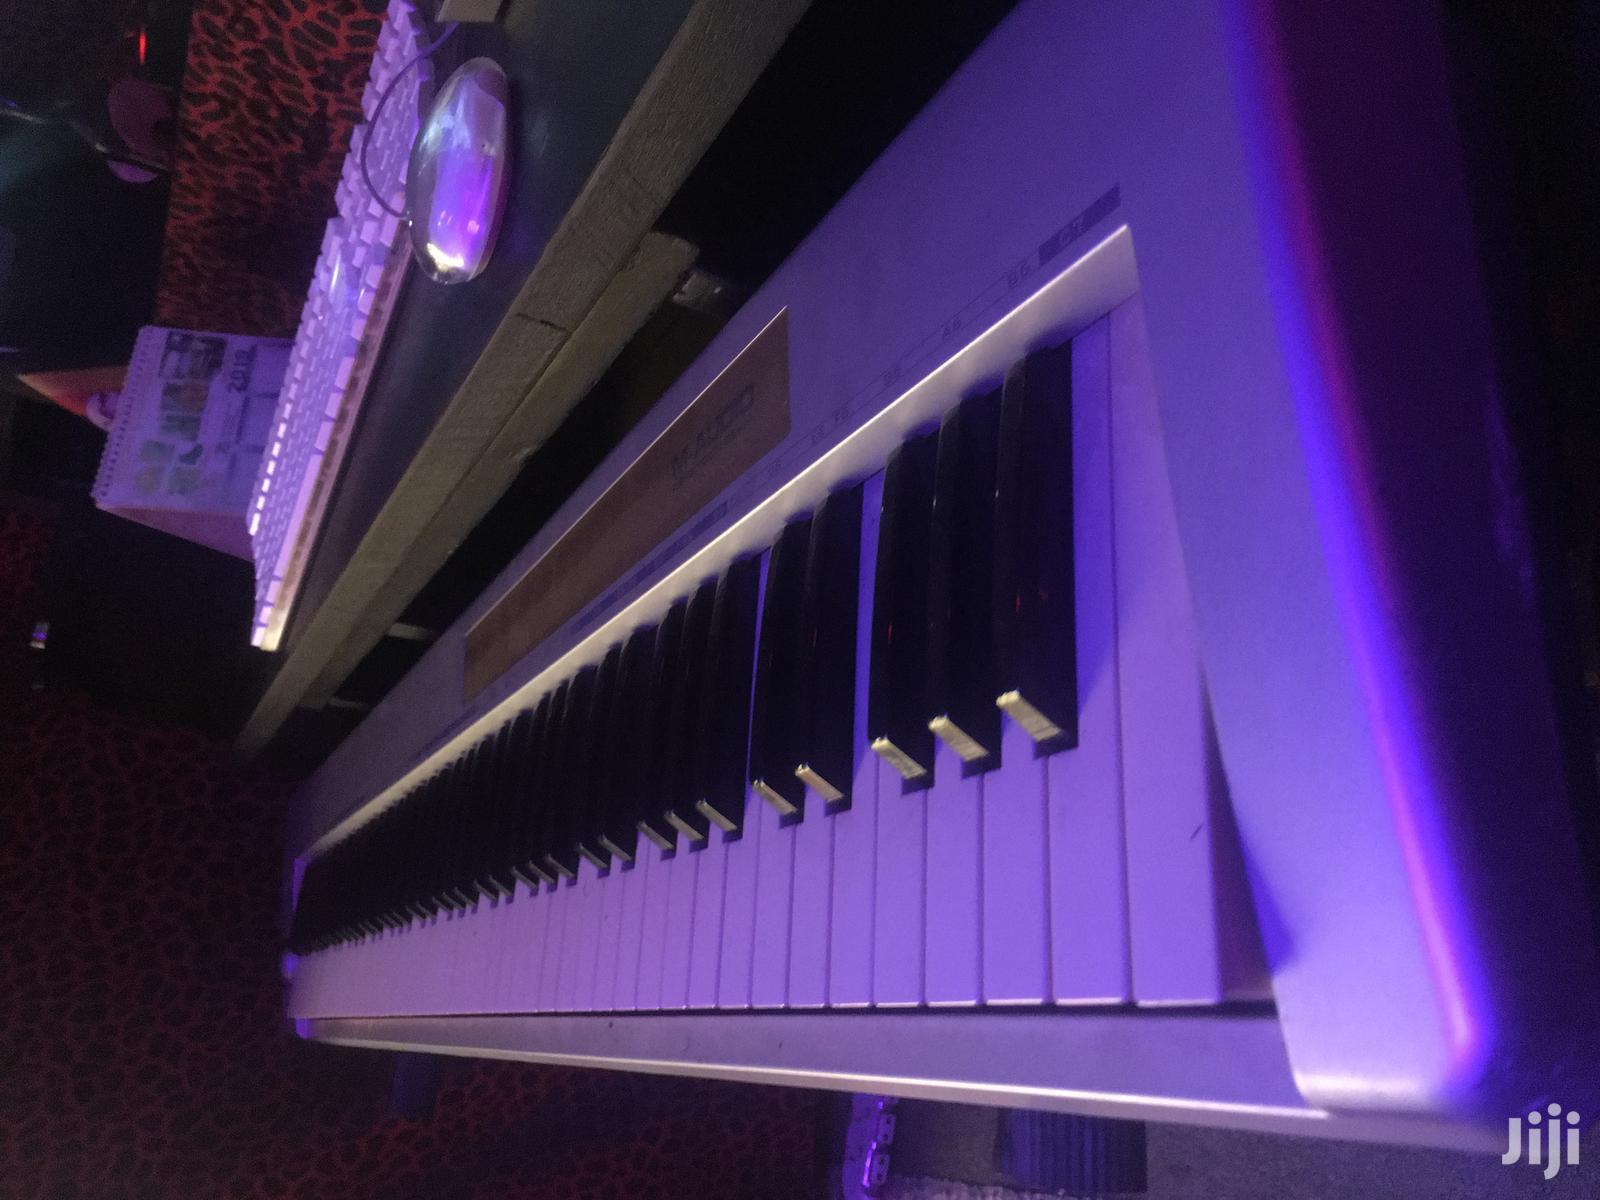 M Audio Midi Studio Piano | Musical Instruments & Gear for sale in Kampala, Central Region, Uganda